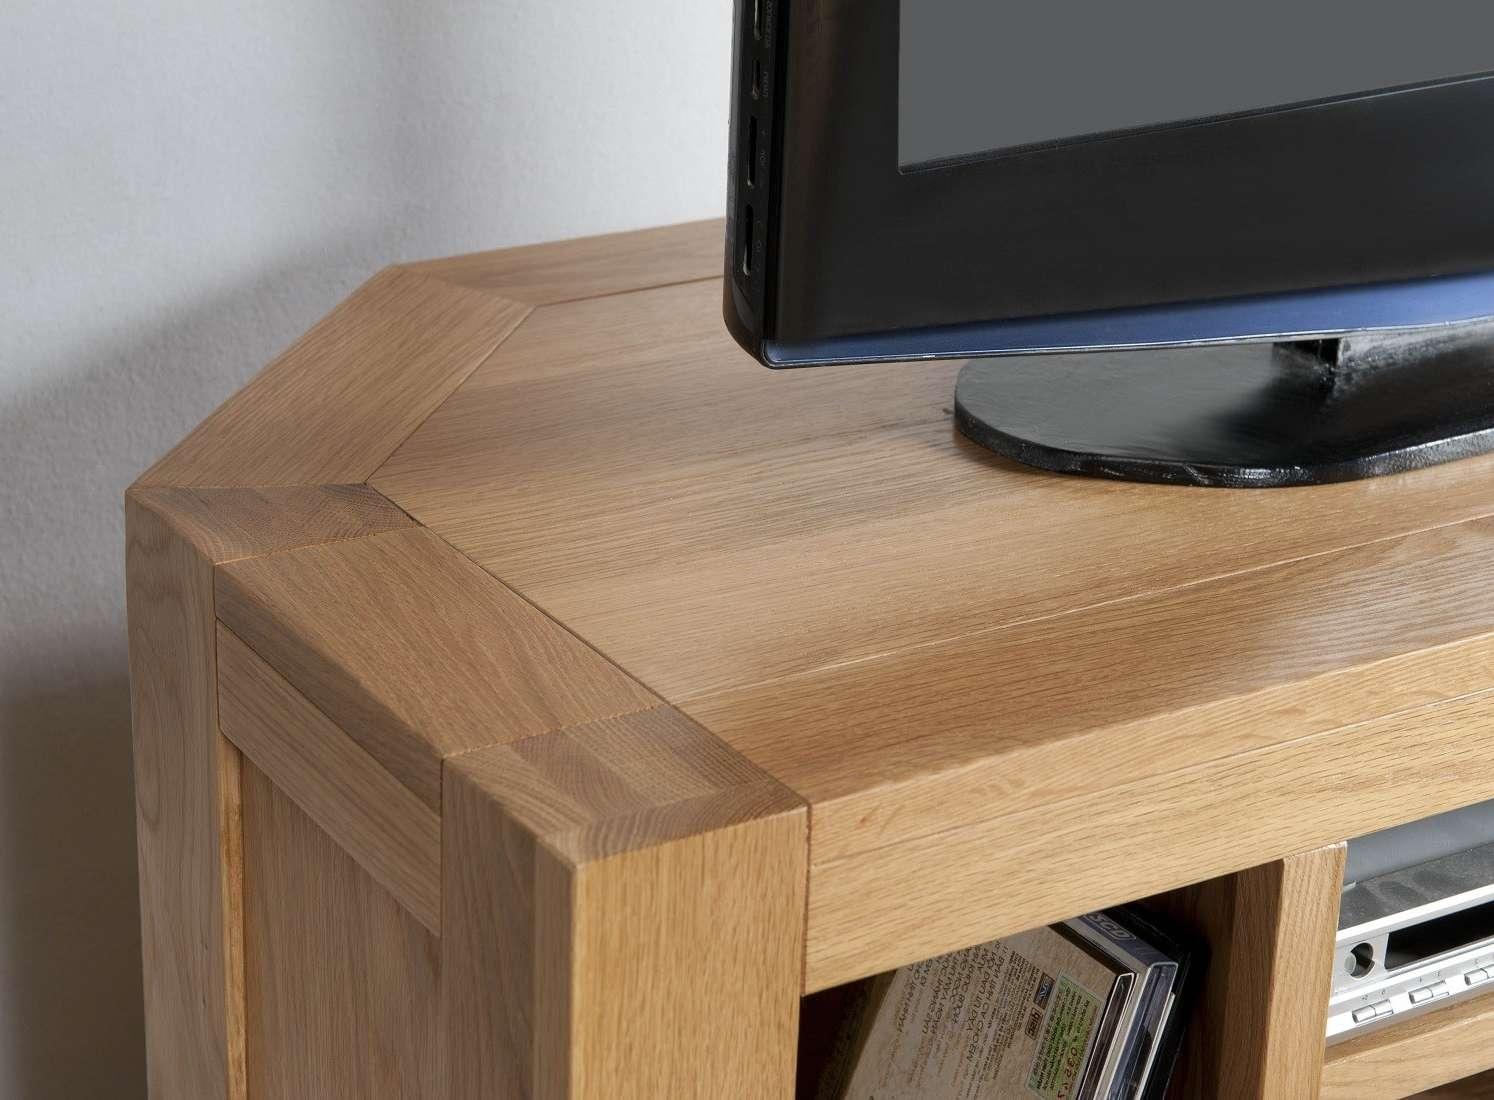 Aylesbury Contemporary Light Oak Corner Tv Unit | Oak Furniture Uk Regarding Light Oak Corner Tv Cabinets (View 2 of 20)